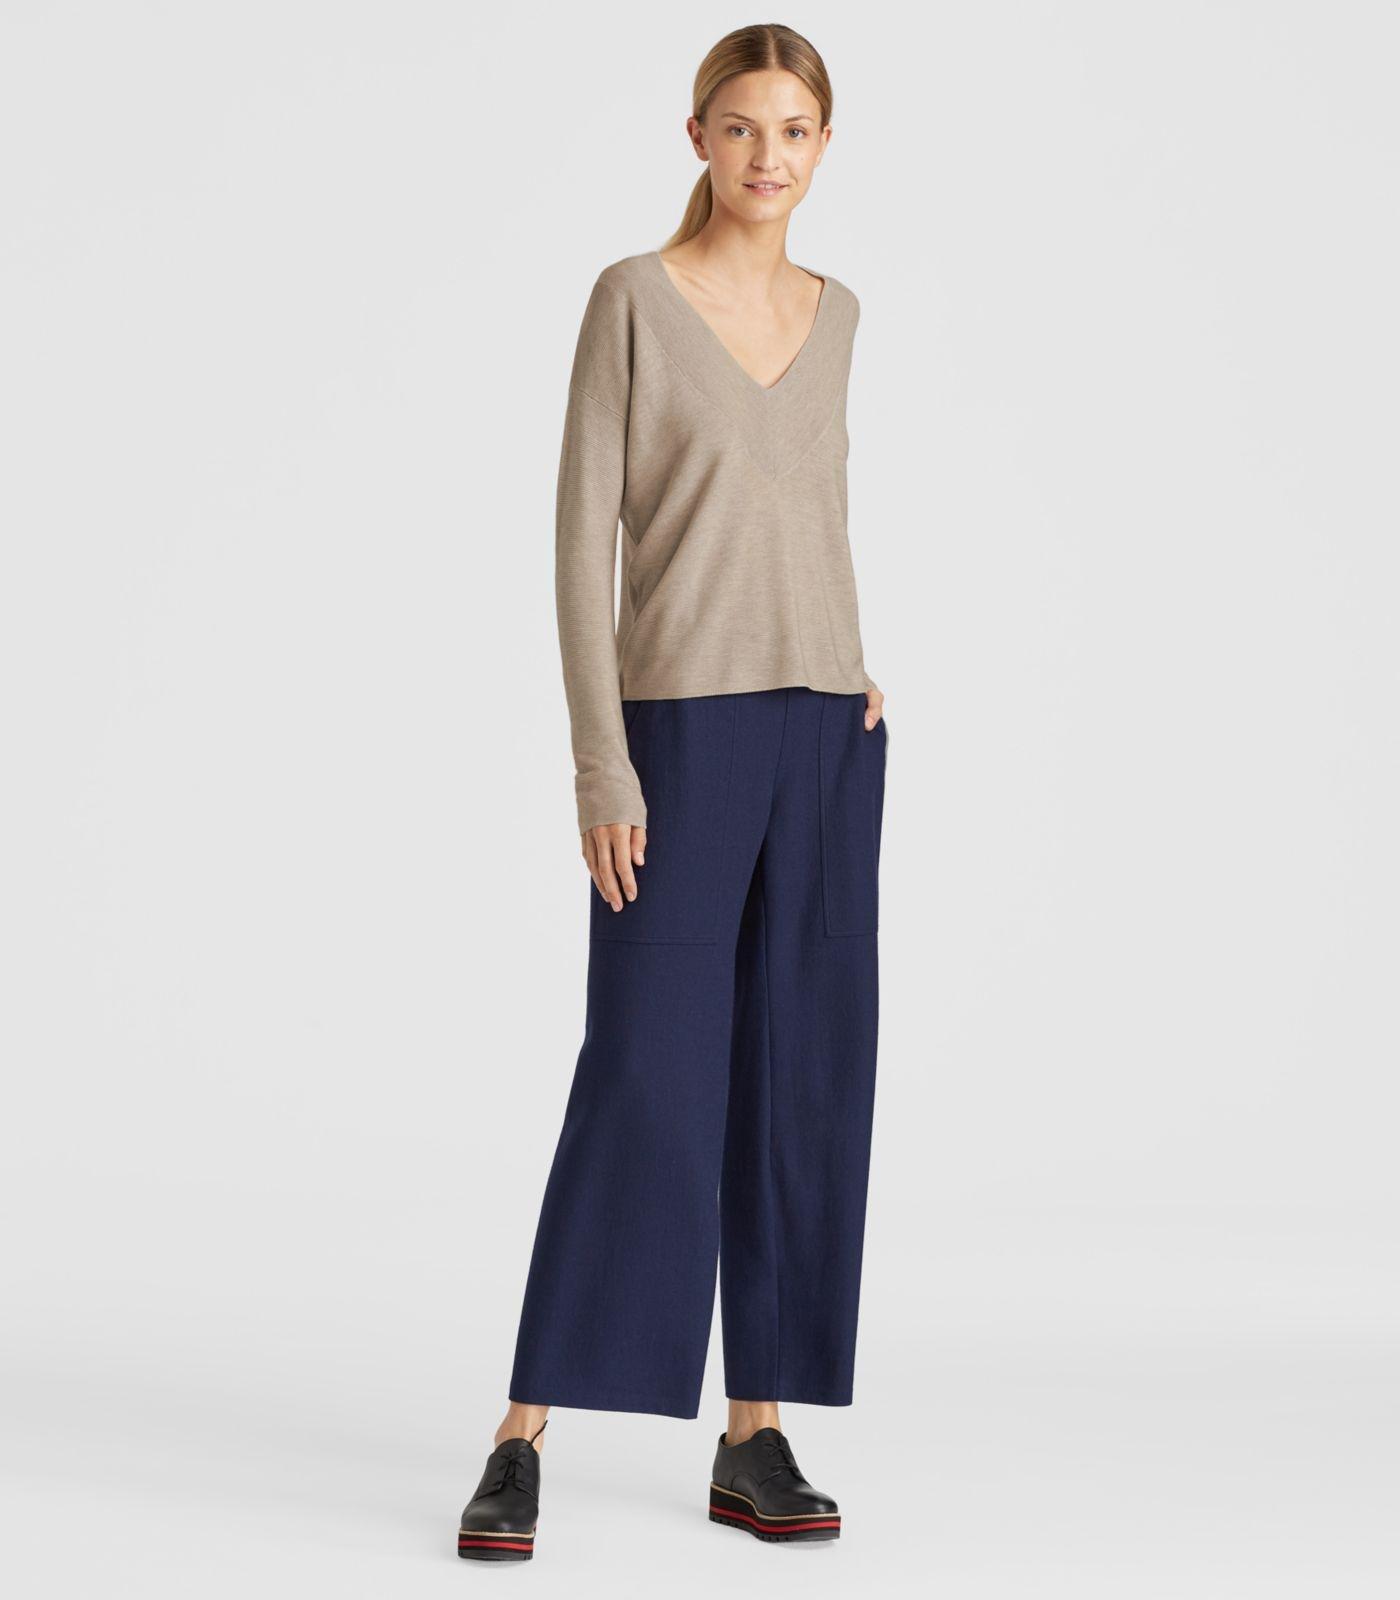 551d0acde7 Lyst - Eileen Fisher Silk V-neck Top